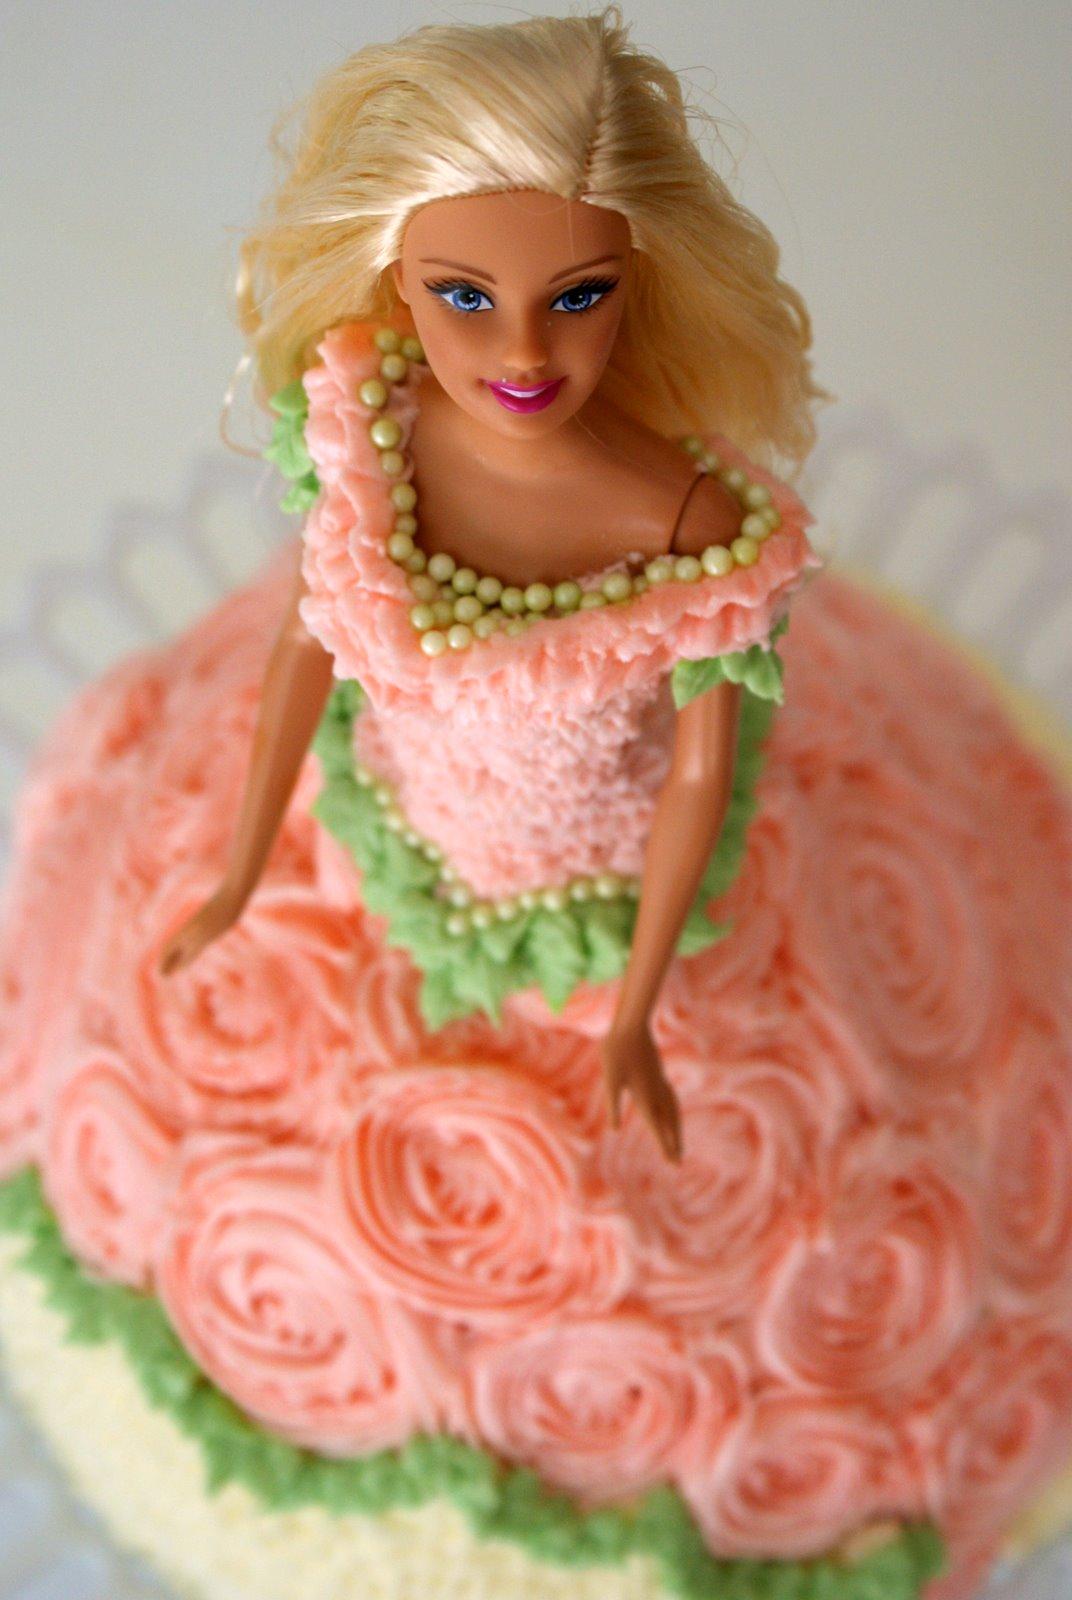 How To Make Barbie Cake For Birthdays